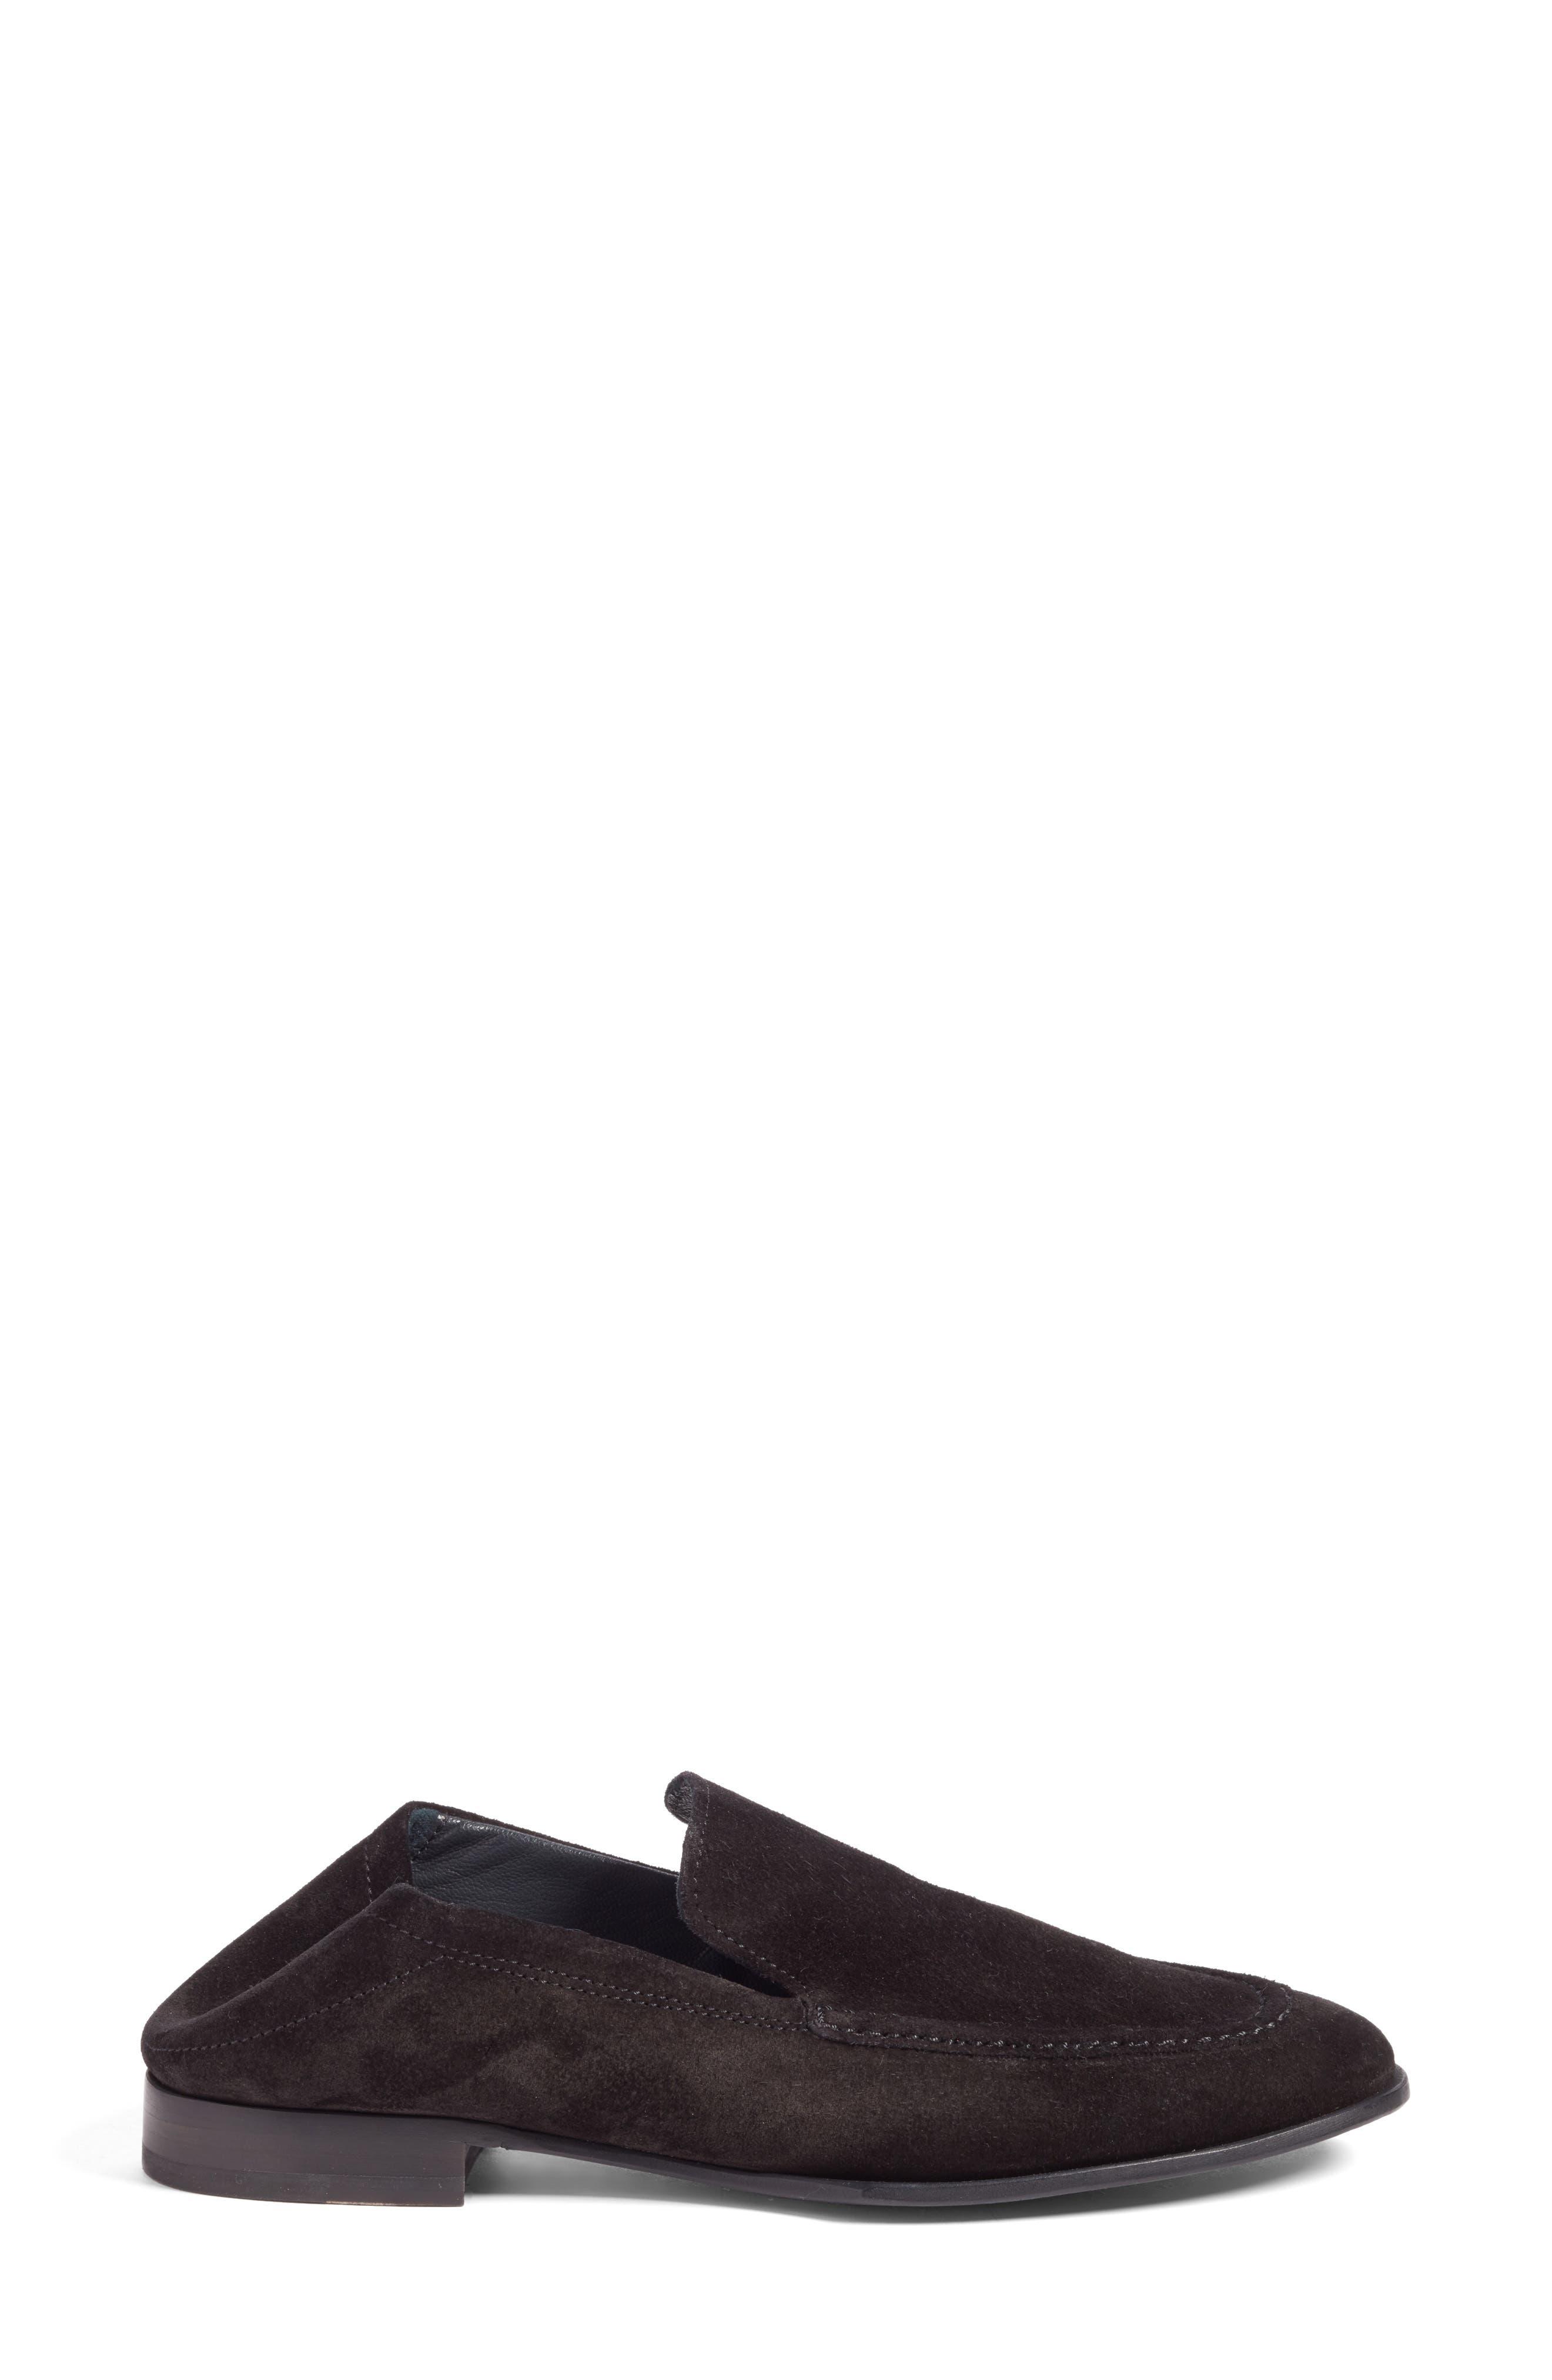 RAG & BONE,                             Alix Convertible Loafer,                             Alternate thumbnail 4, color,                             008